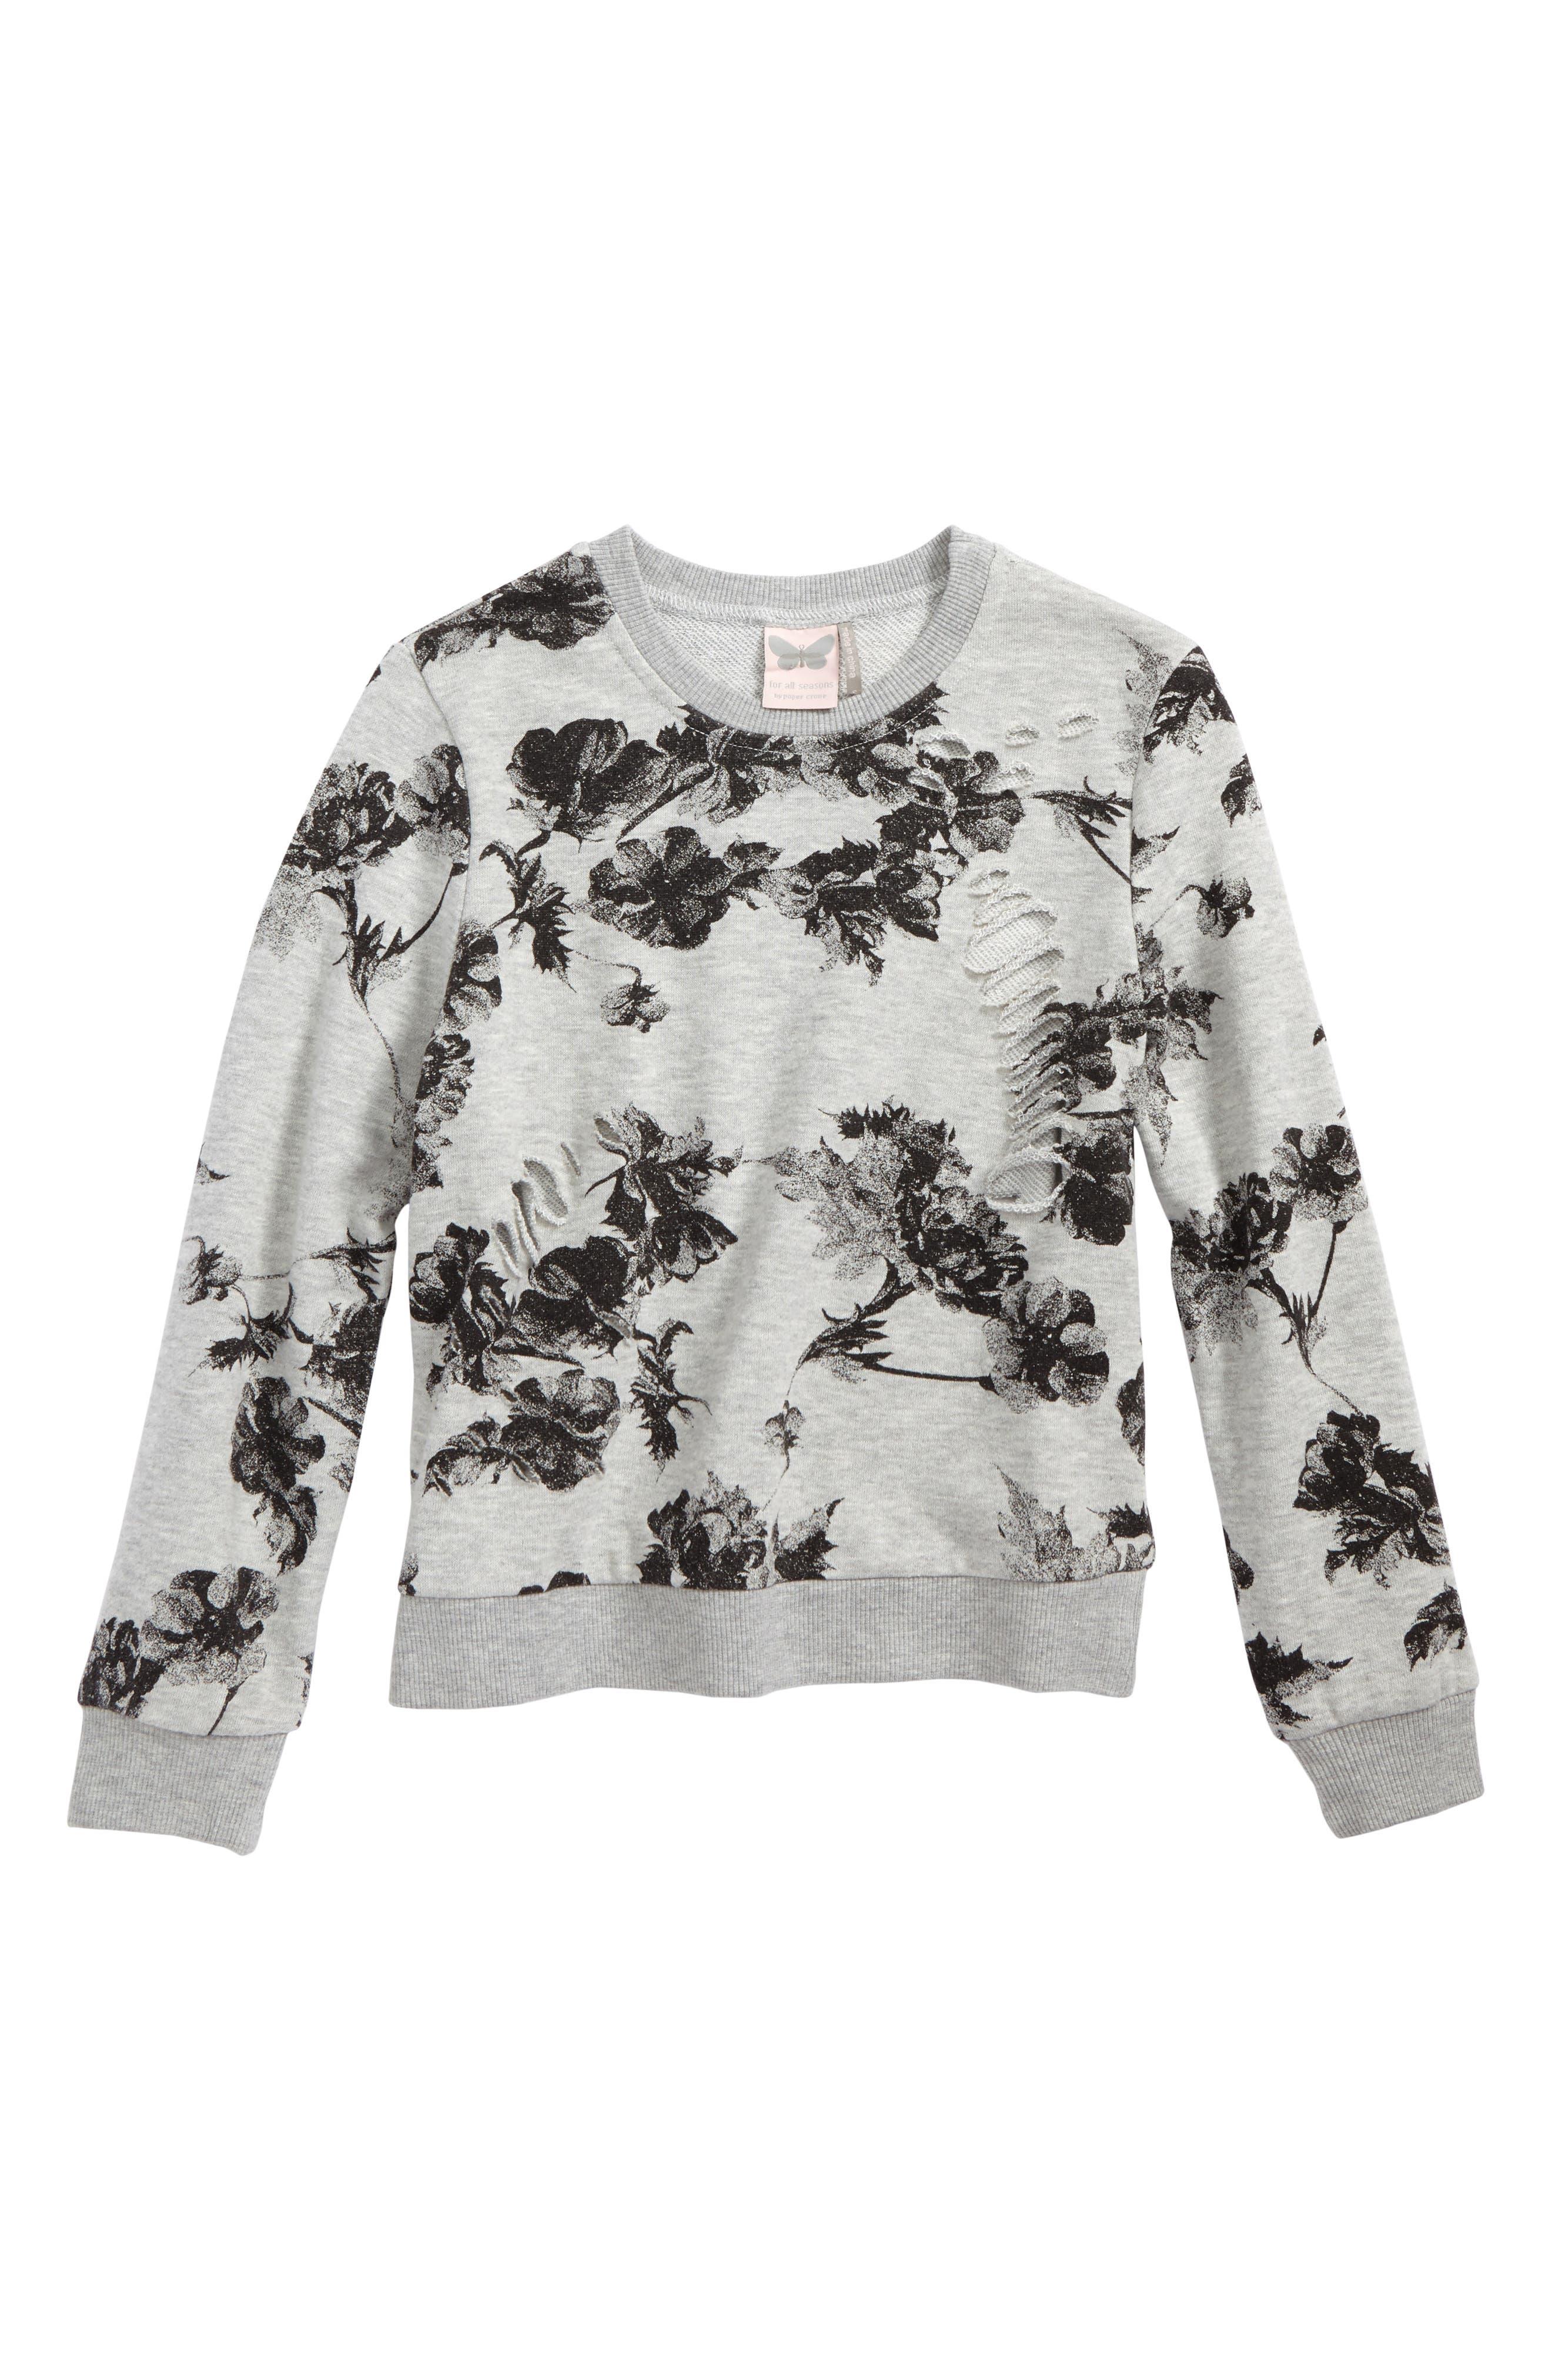 Main Image - For All Seasons Floral Print Sweatshirt (Big Girls)